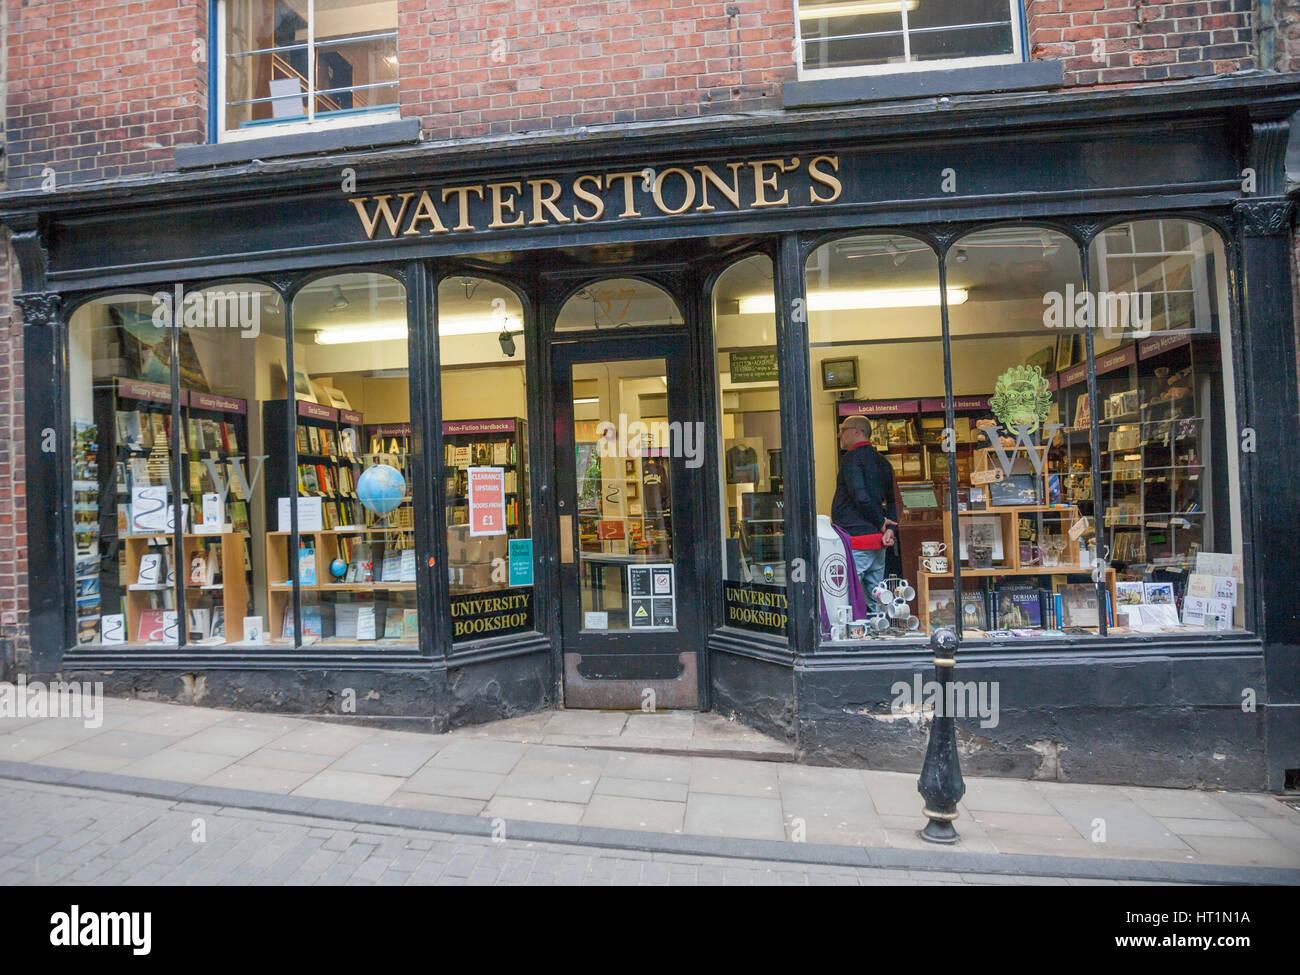 Waterstones Bookshop In Durham City Center England Uk Stock Photo